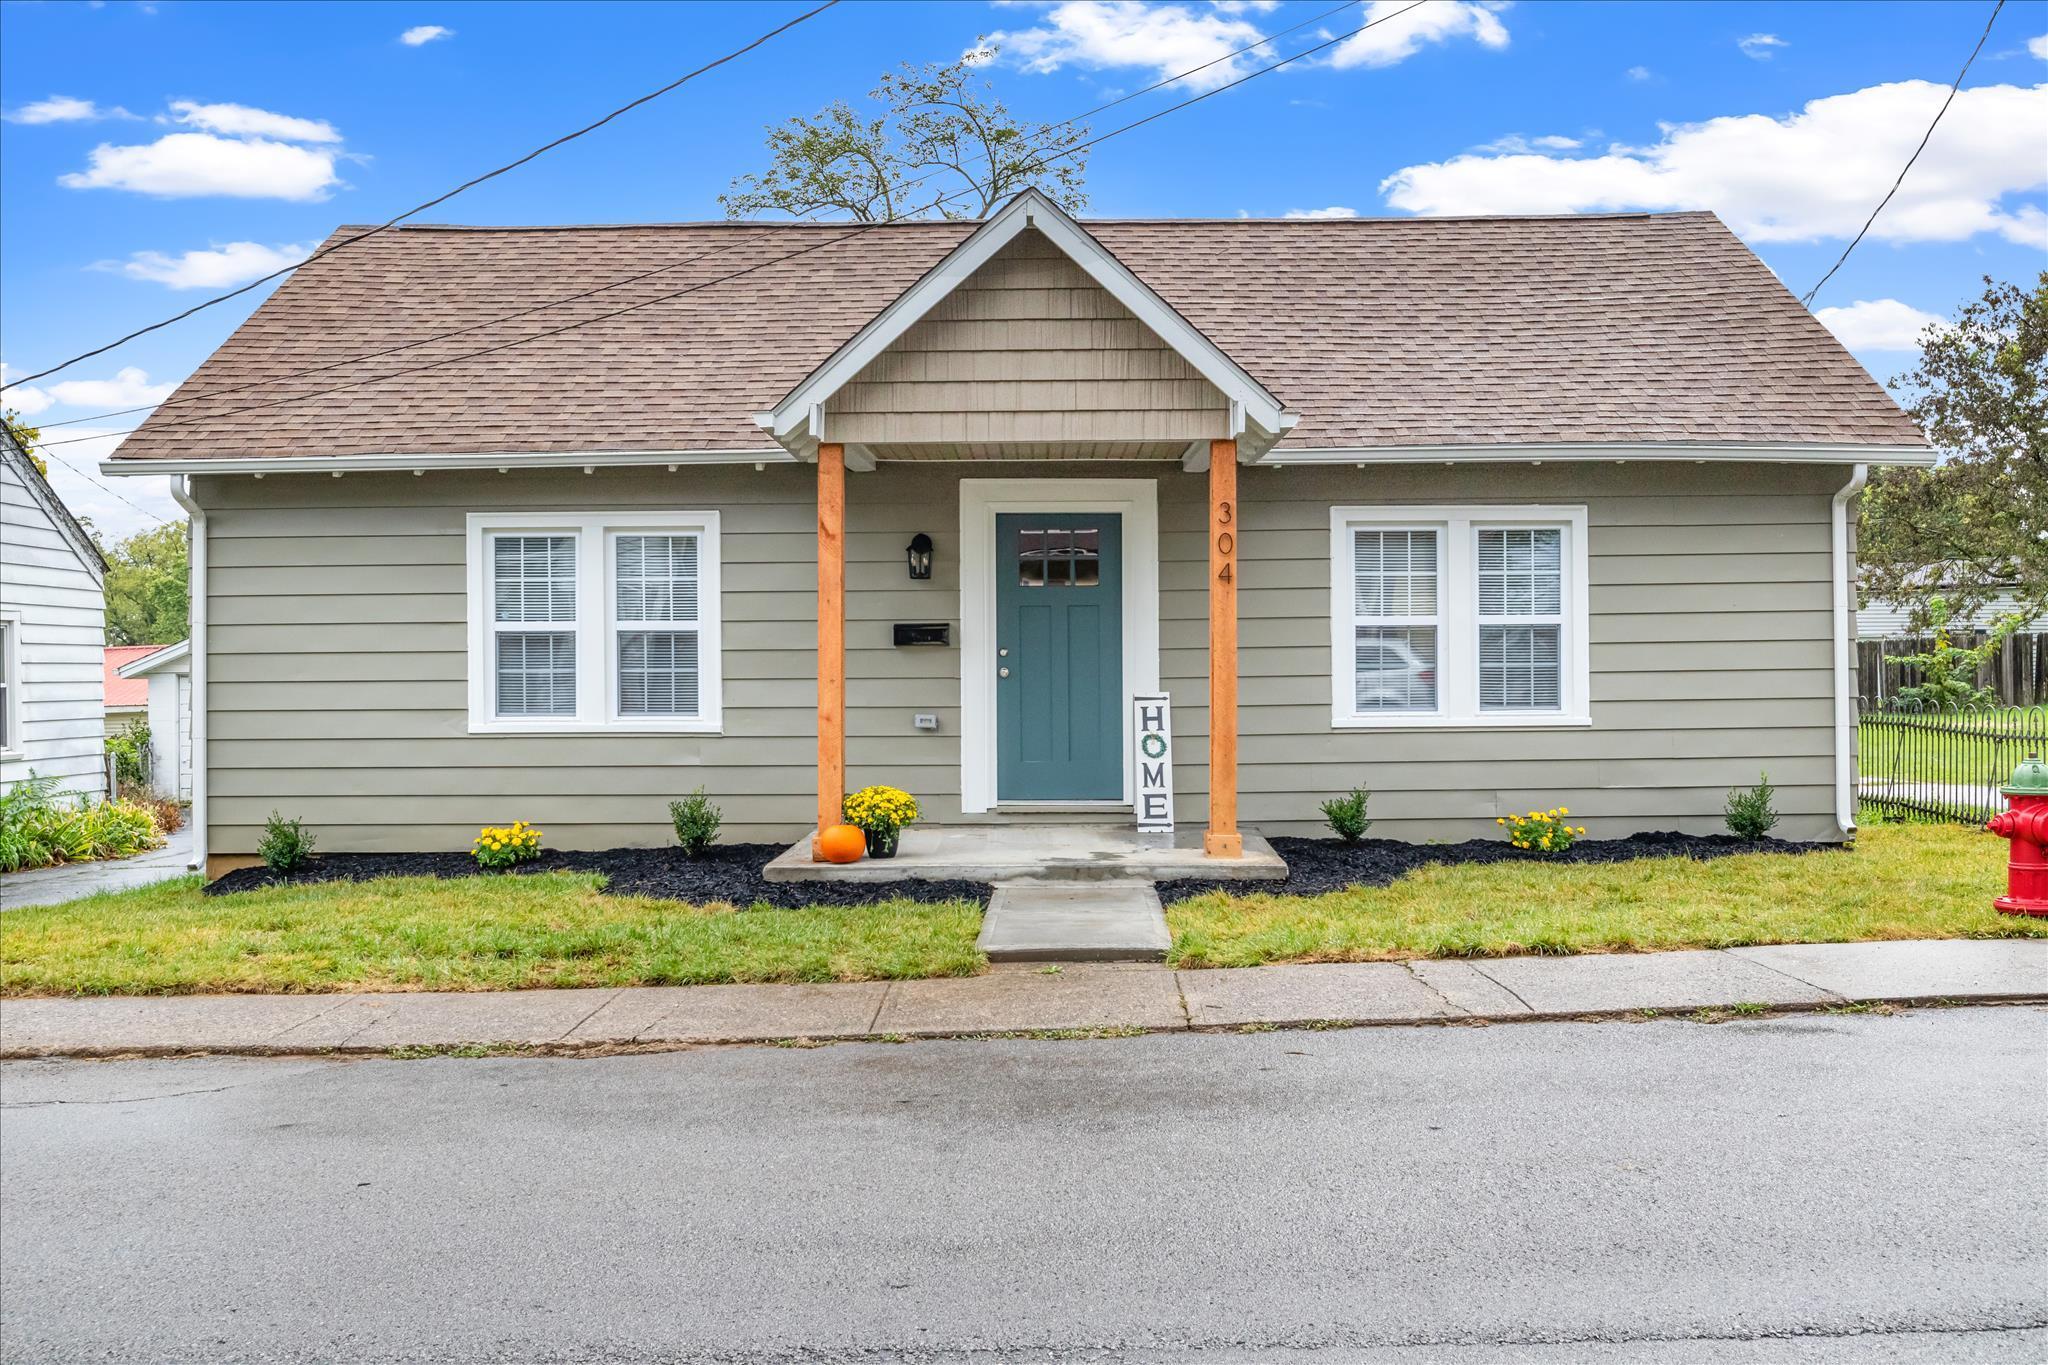 304 3rd Street, Nicholasville, Kentucky 40356, 3 Bedrooms Bedrooms, ,1 BathroomBathrooms,Residential,For Sale,3rd,20120288